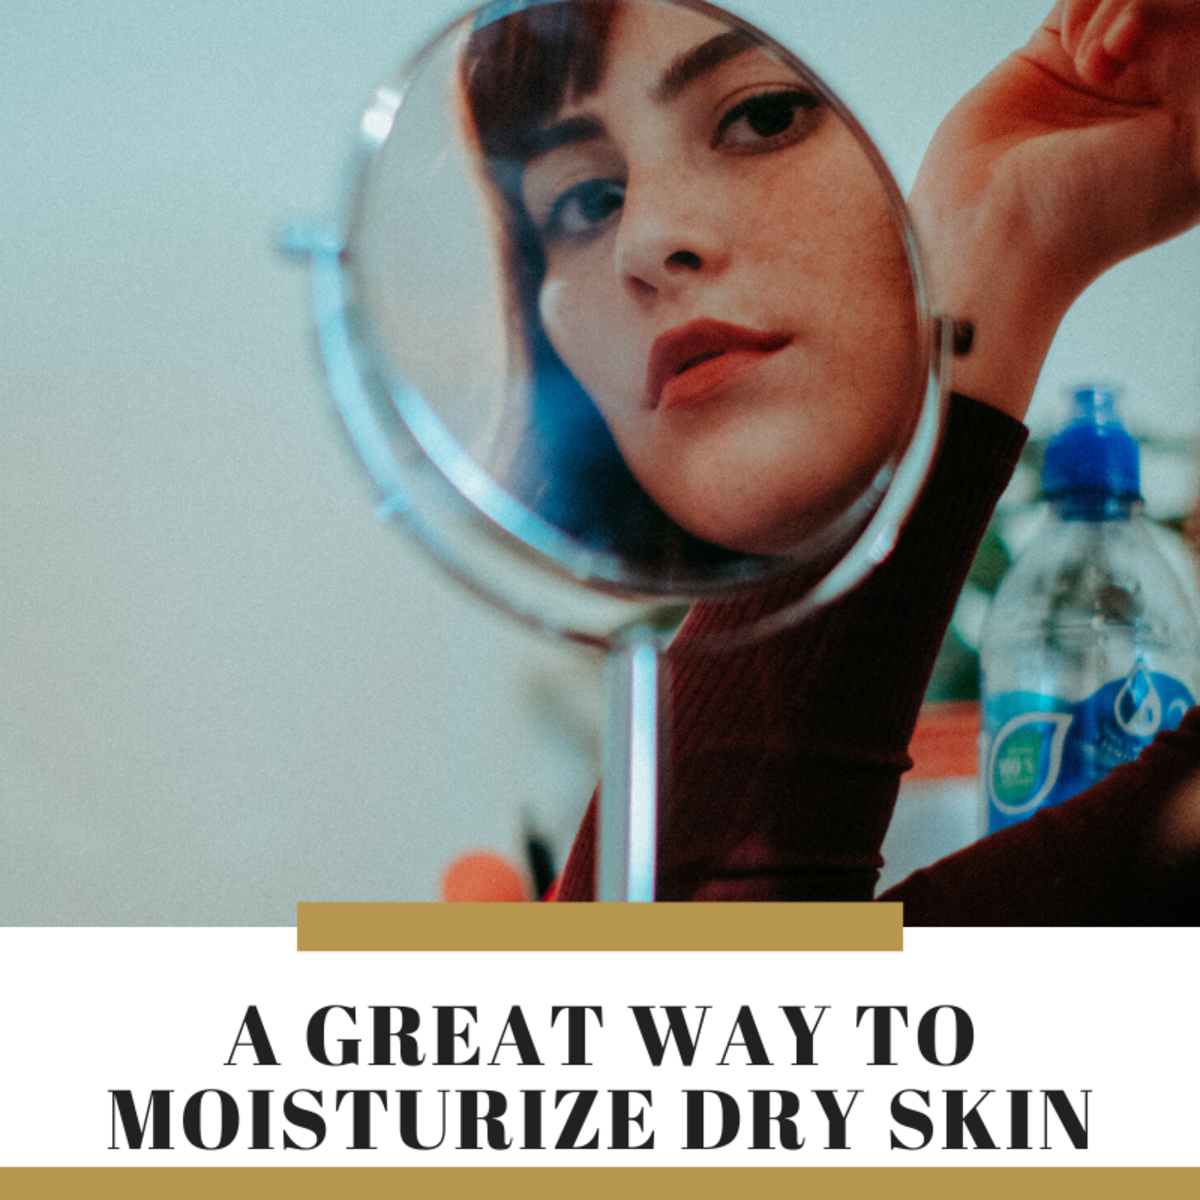 Moisturize Dry Skin: Herbal Face Steam